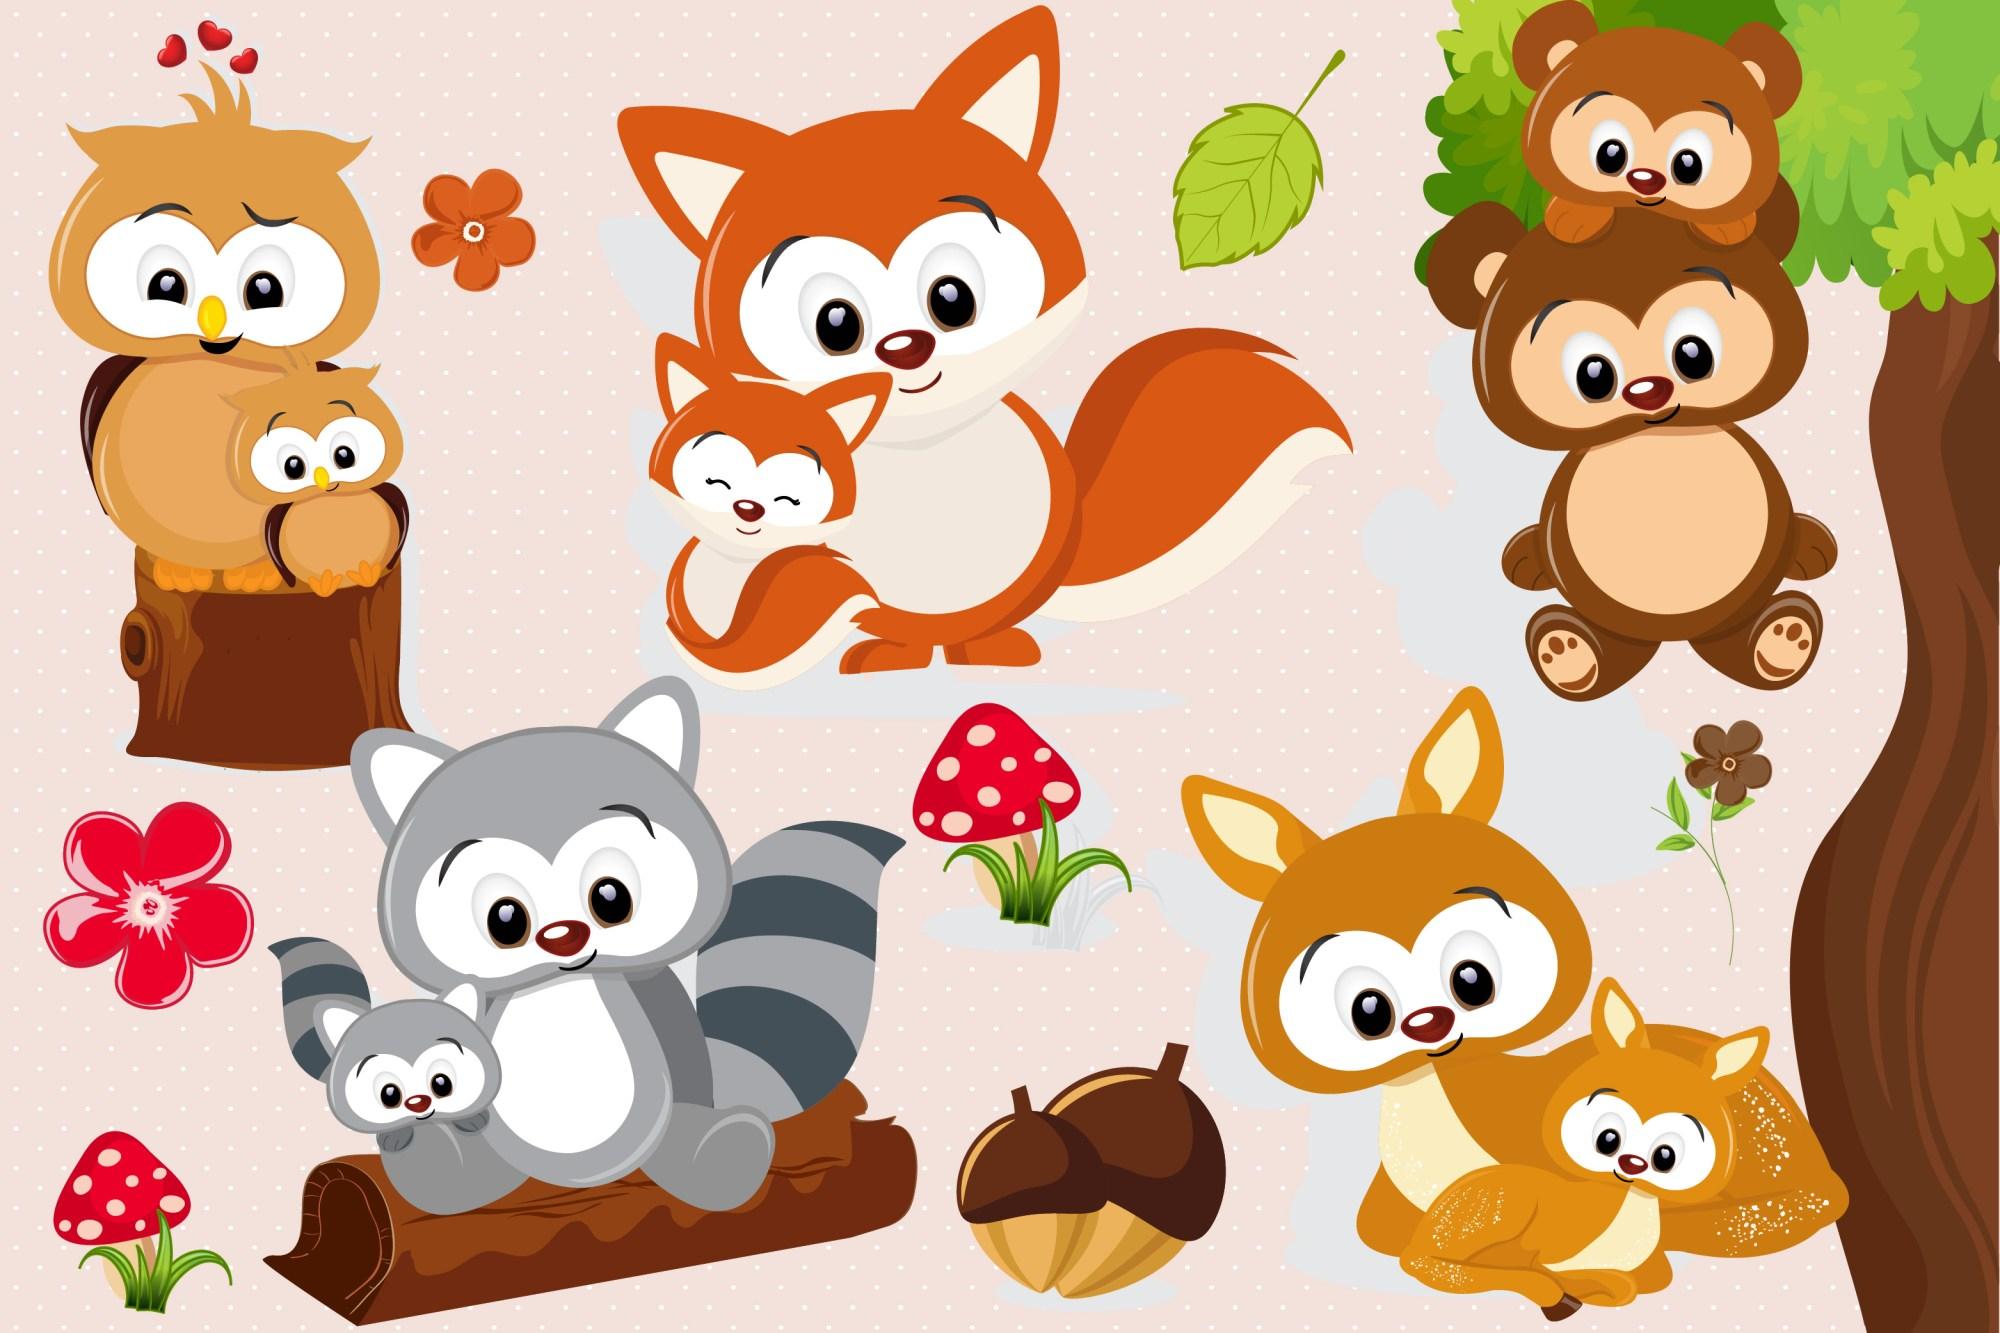 hight resolution of woodland animal clipart woodland animal graphics example image 1